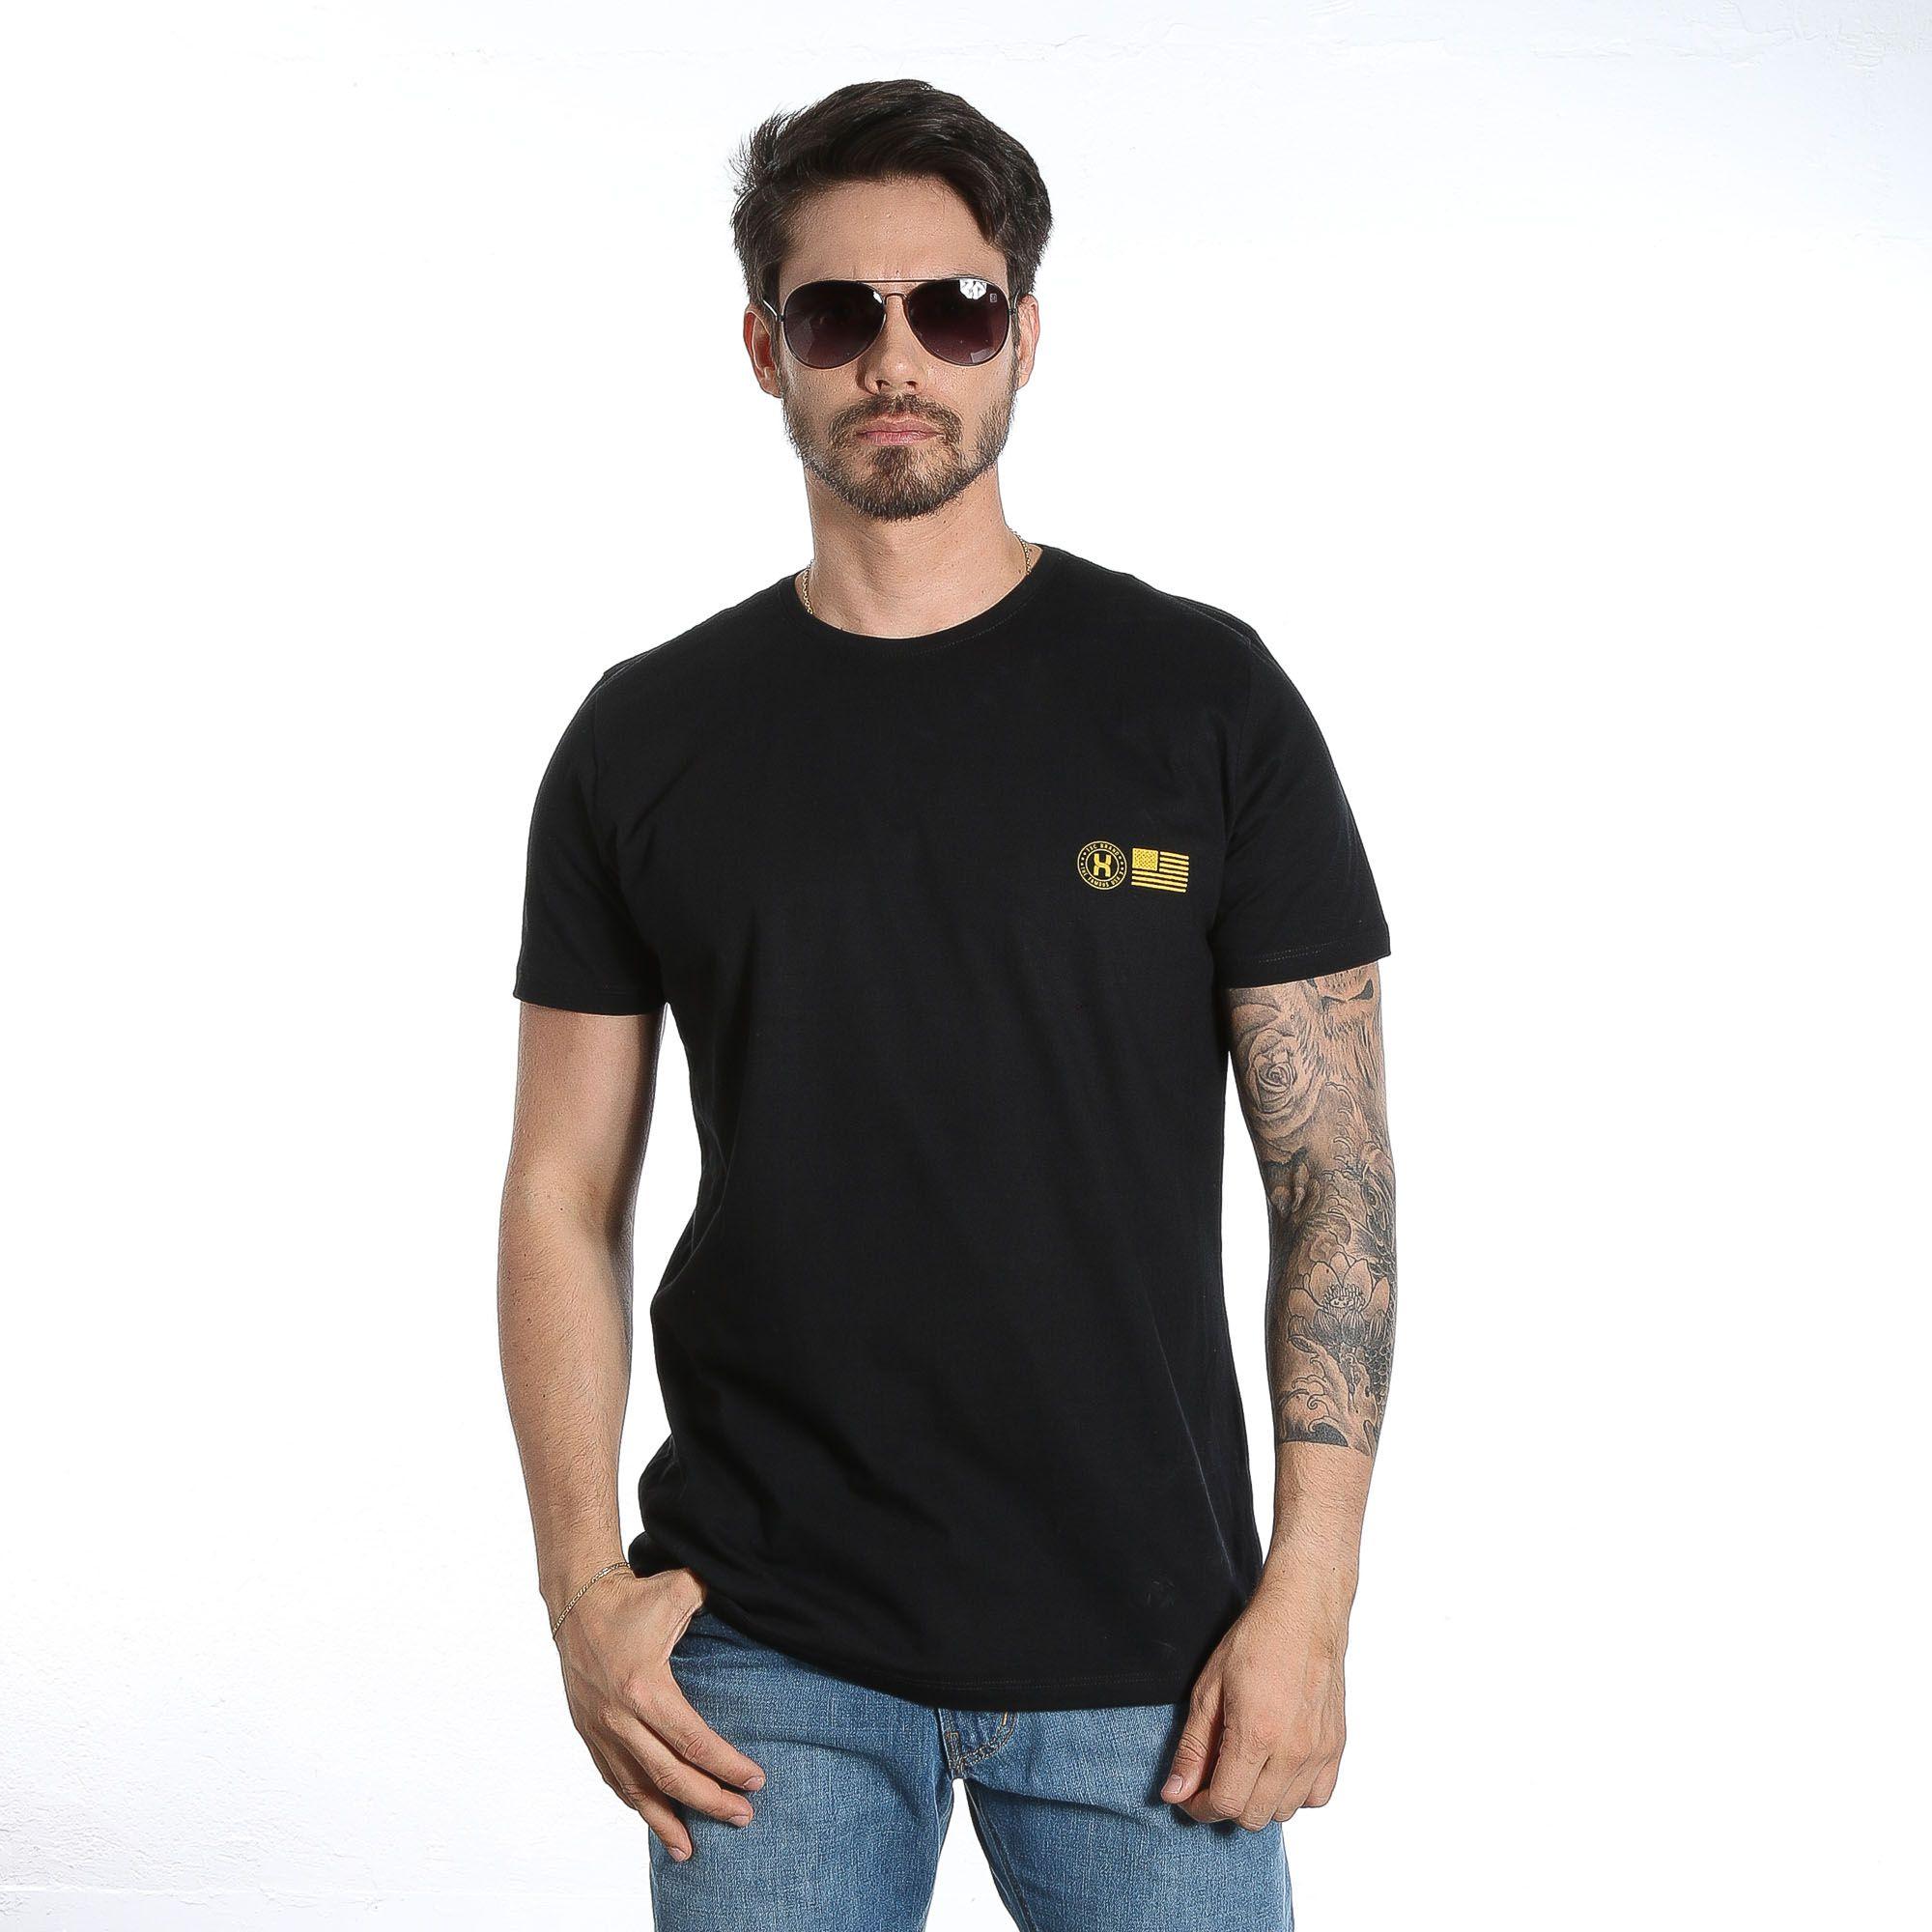 Camiseta Masculina TXC 1544